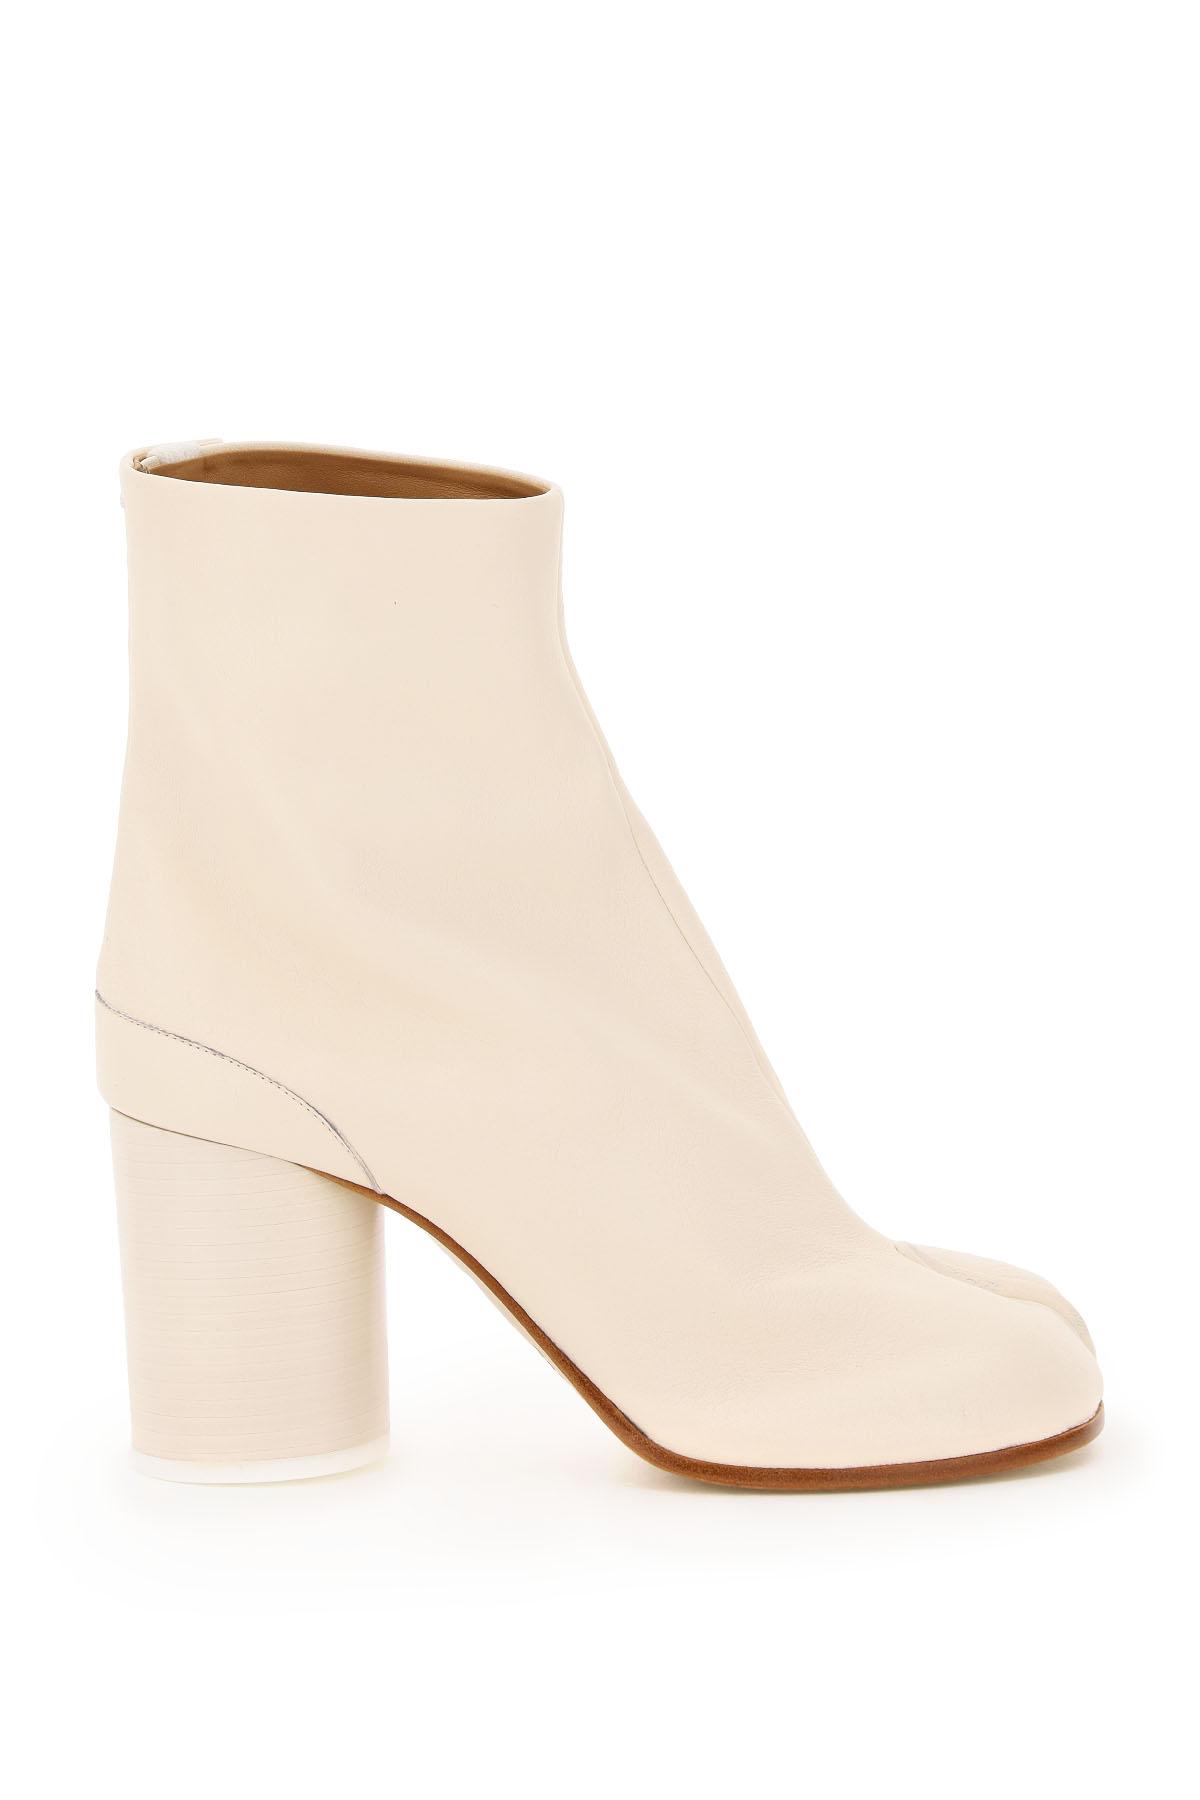 Maison Margiela Tabi Leather Boots 36 White Leather